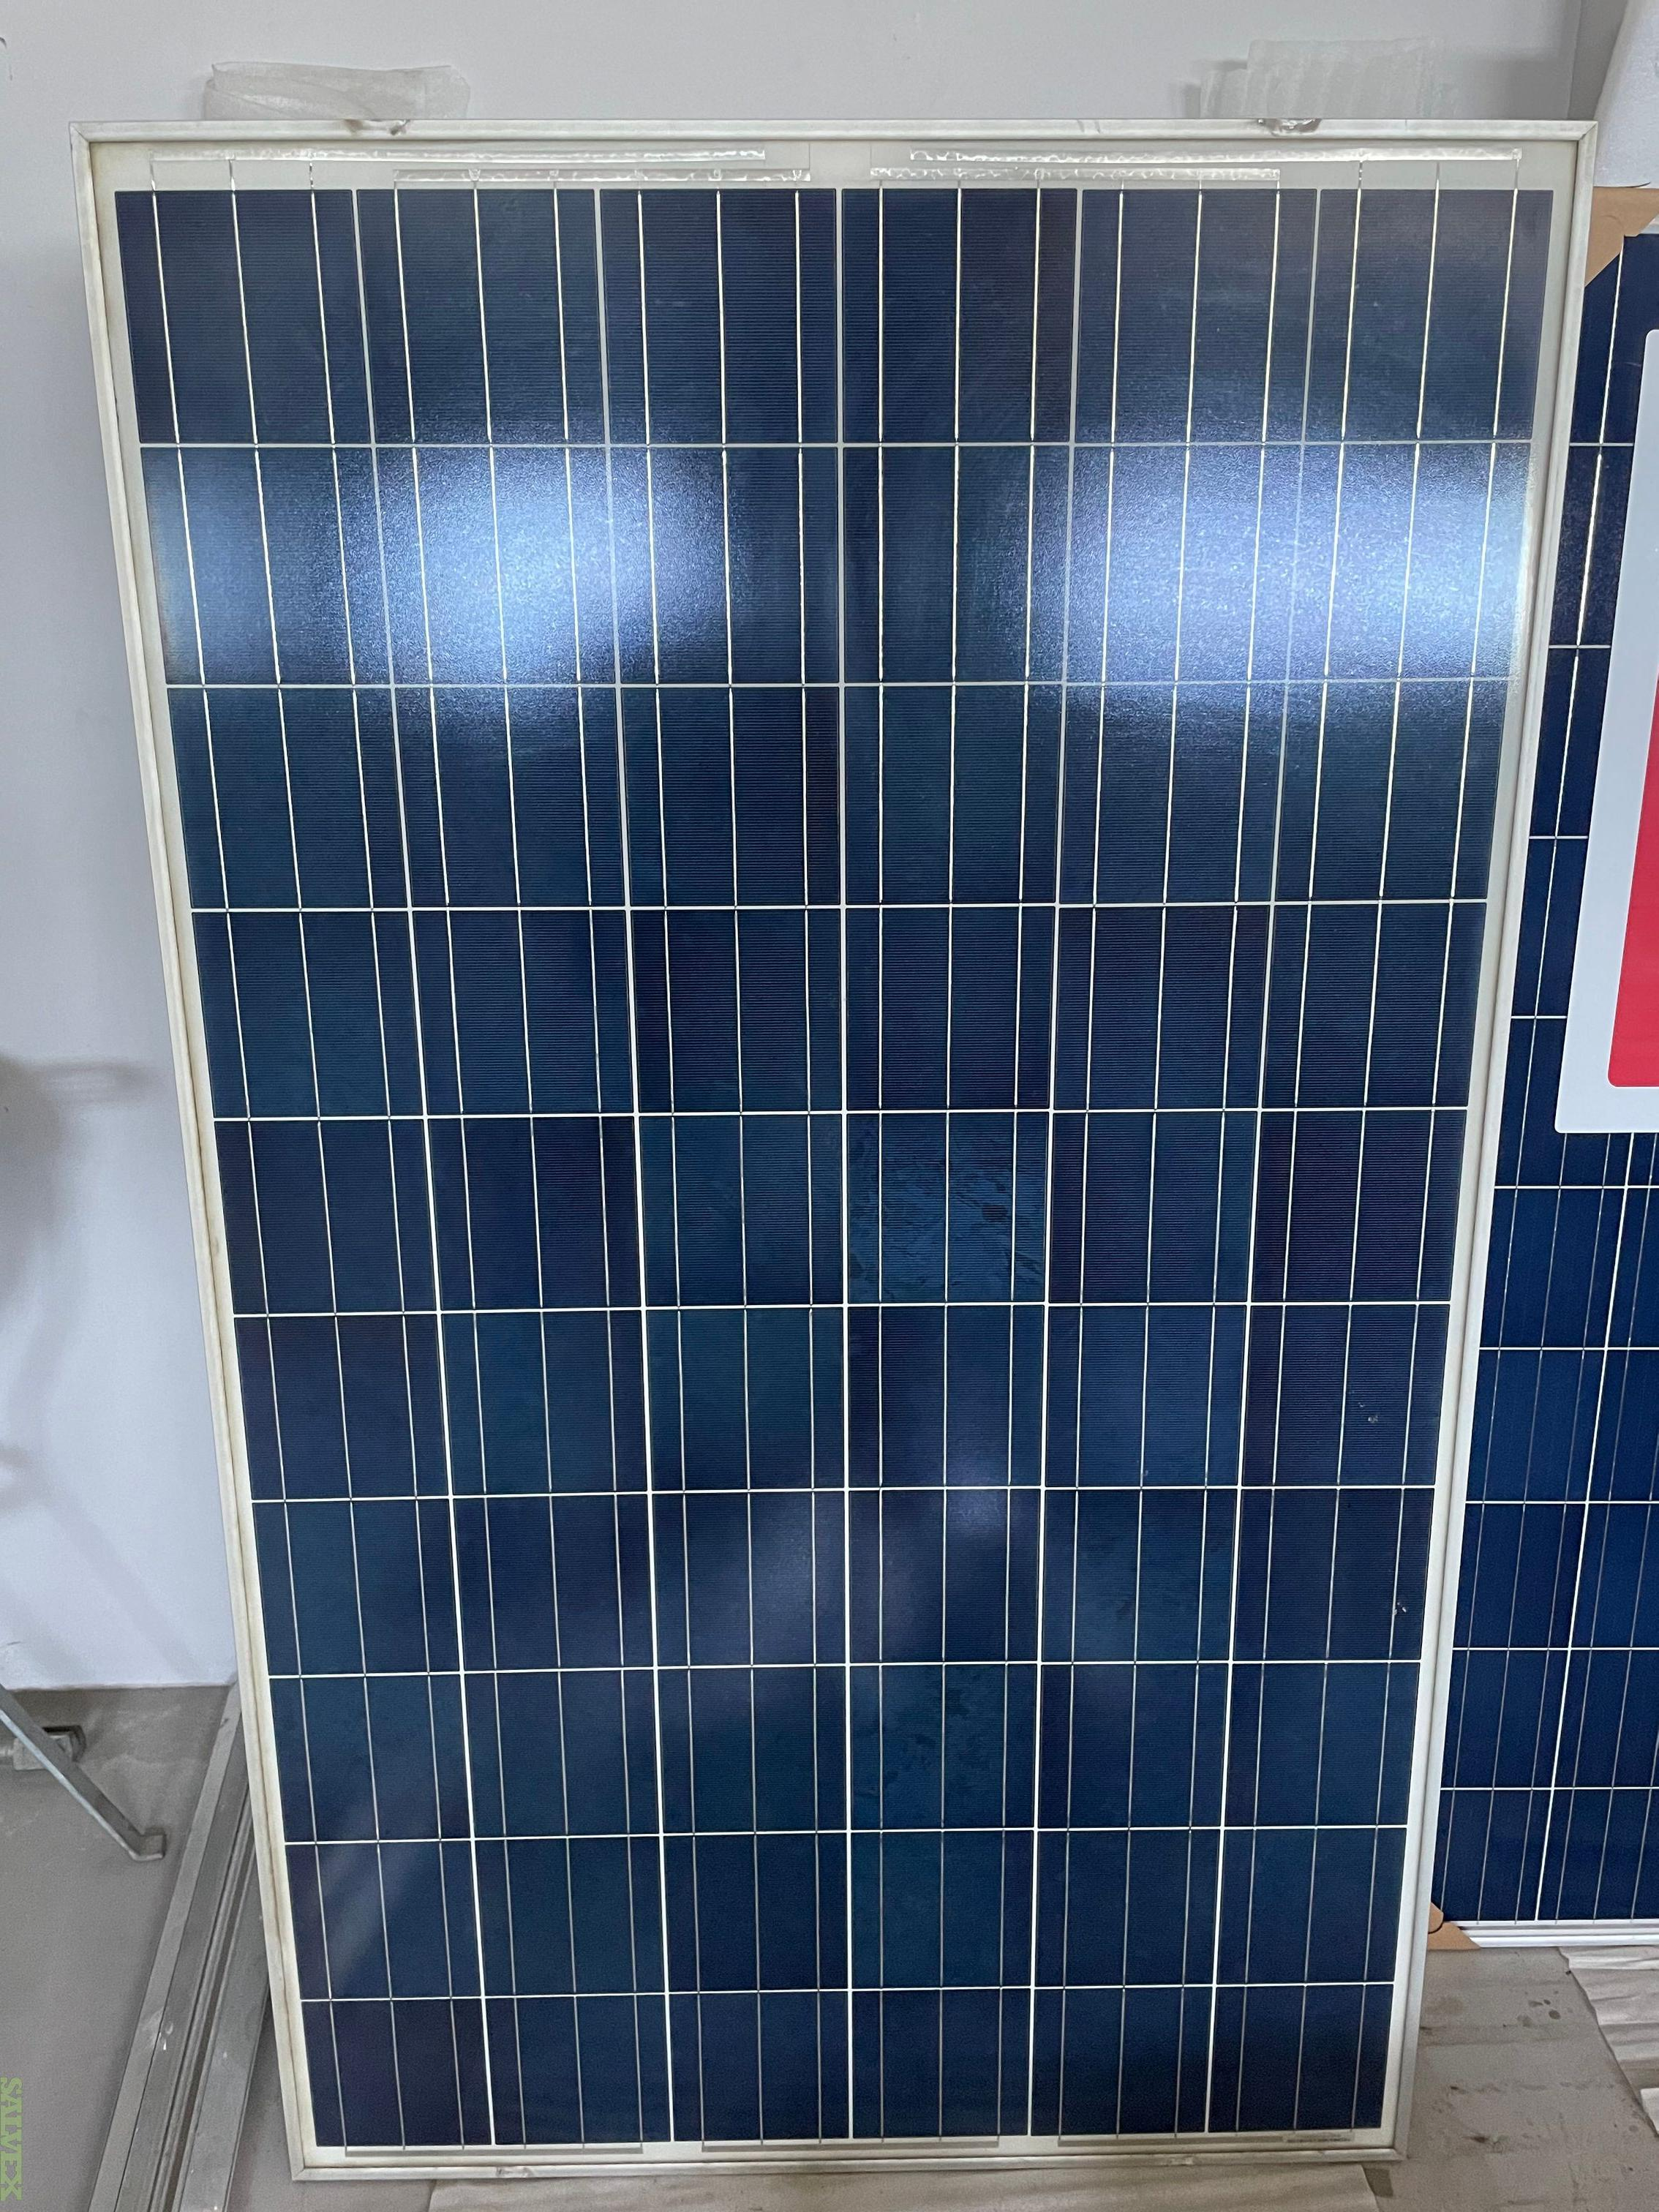 Solar 215W, 245W & 260W Panels (31 Panels)